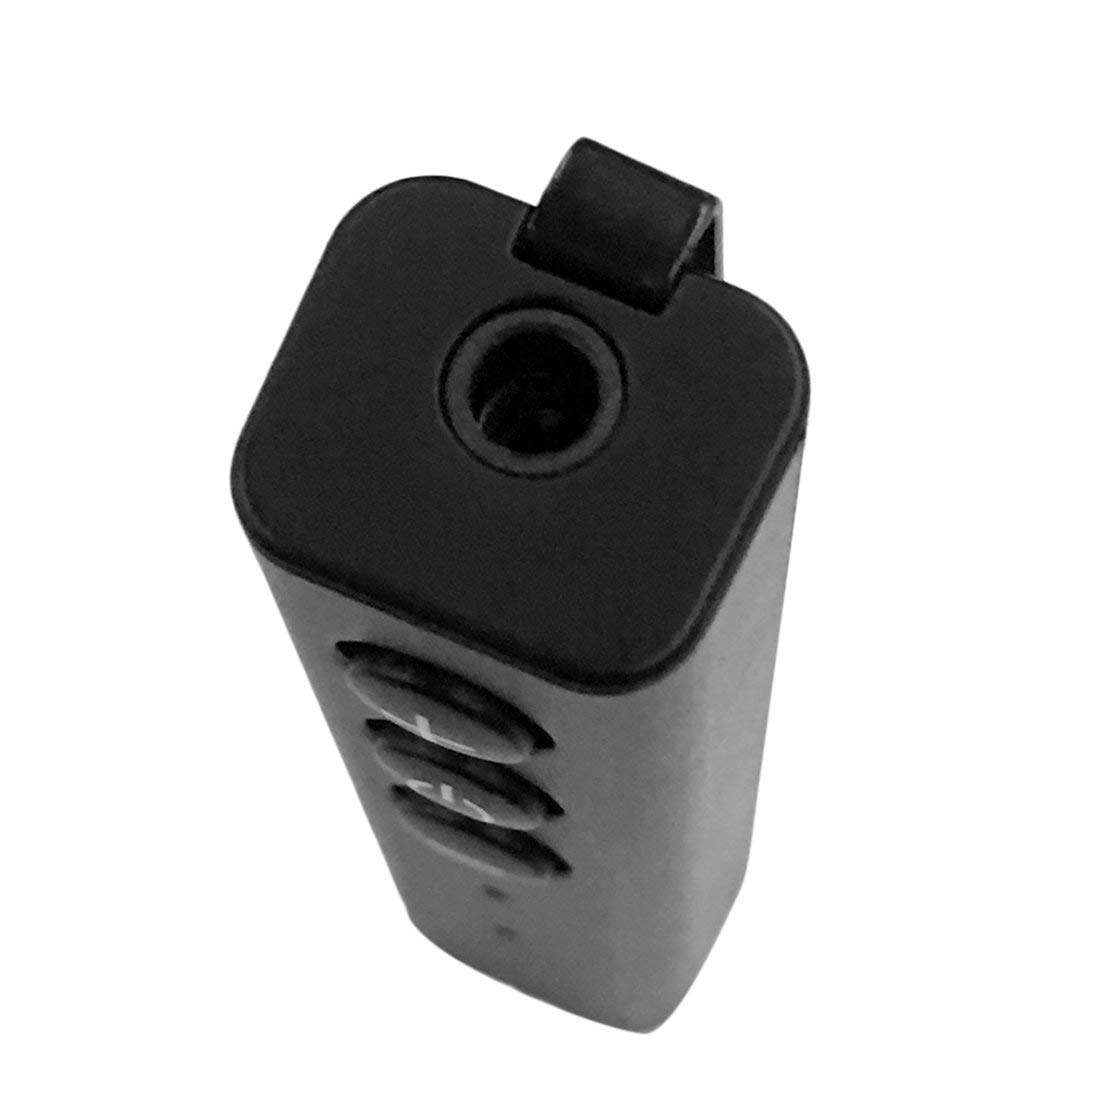 ZF-350 Stiftclip Multifunktions-Bluetooth 4.0-Audioempf/änger 3,5-mm-Aux-Eingang Micro-USB-Anschluss Drahtloser Adapter mit Mikrofon Rone Leben